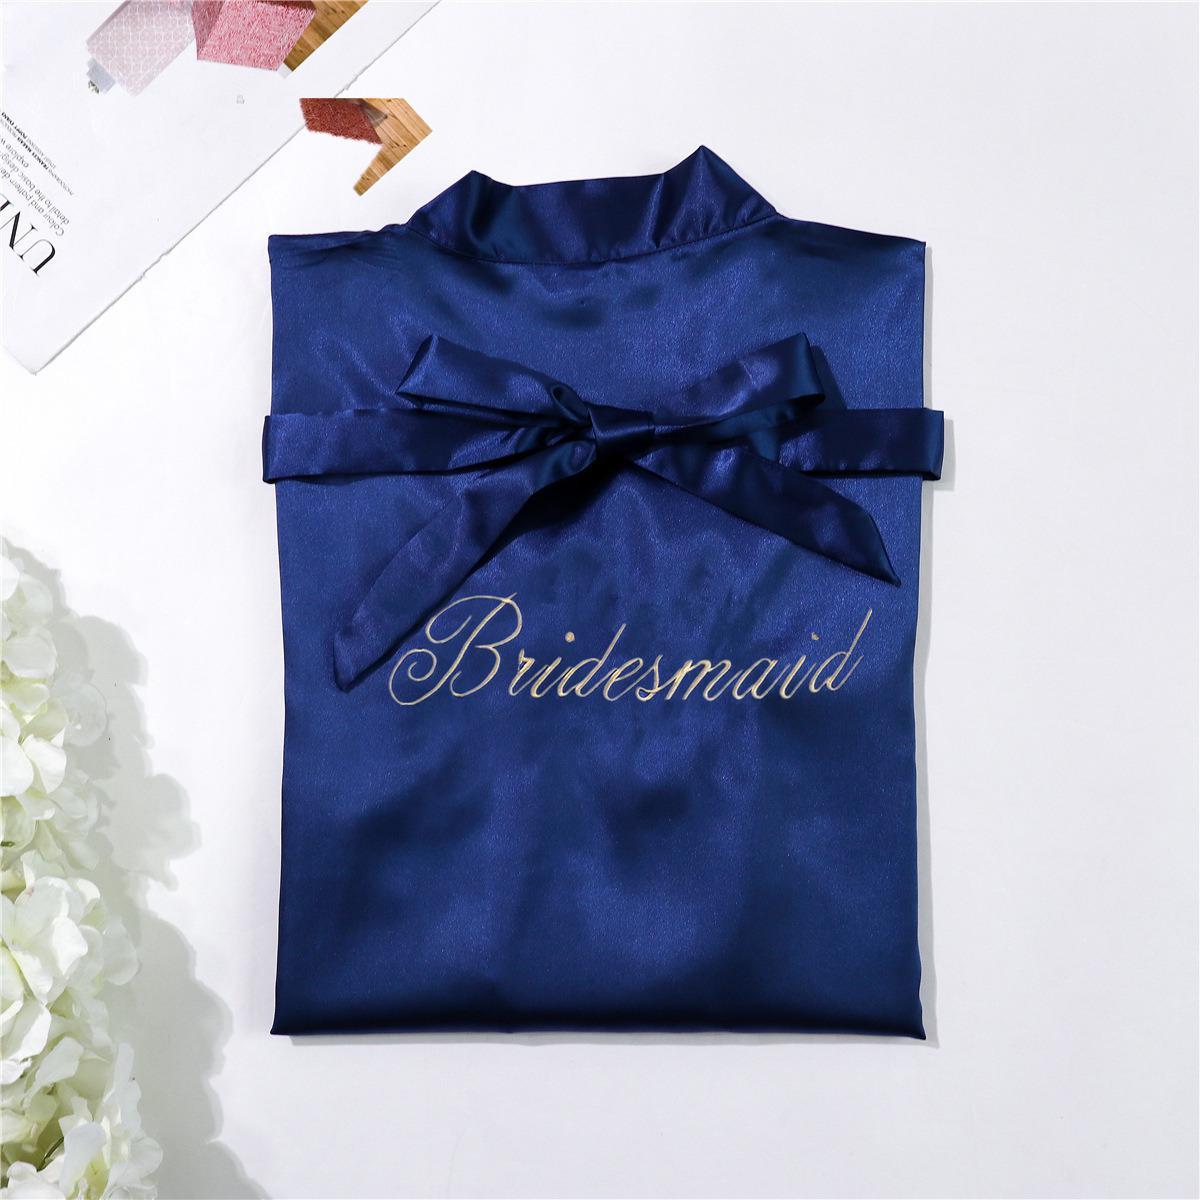 Bridesmaid -2